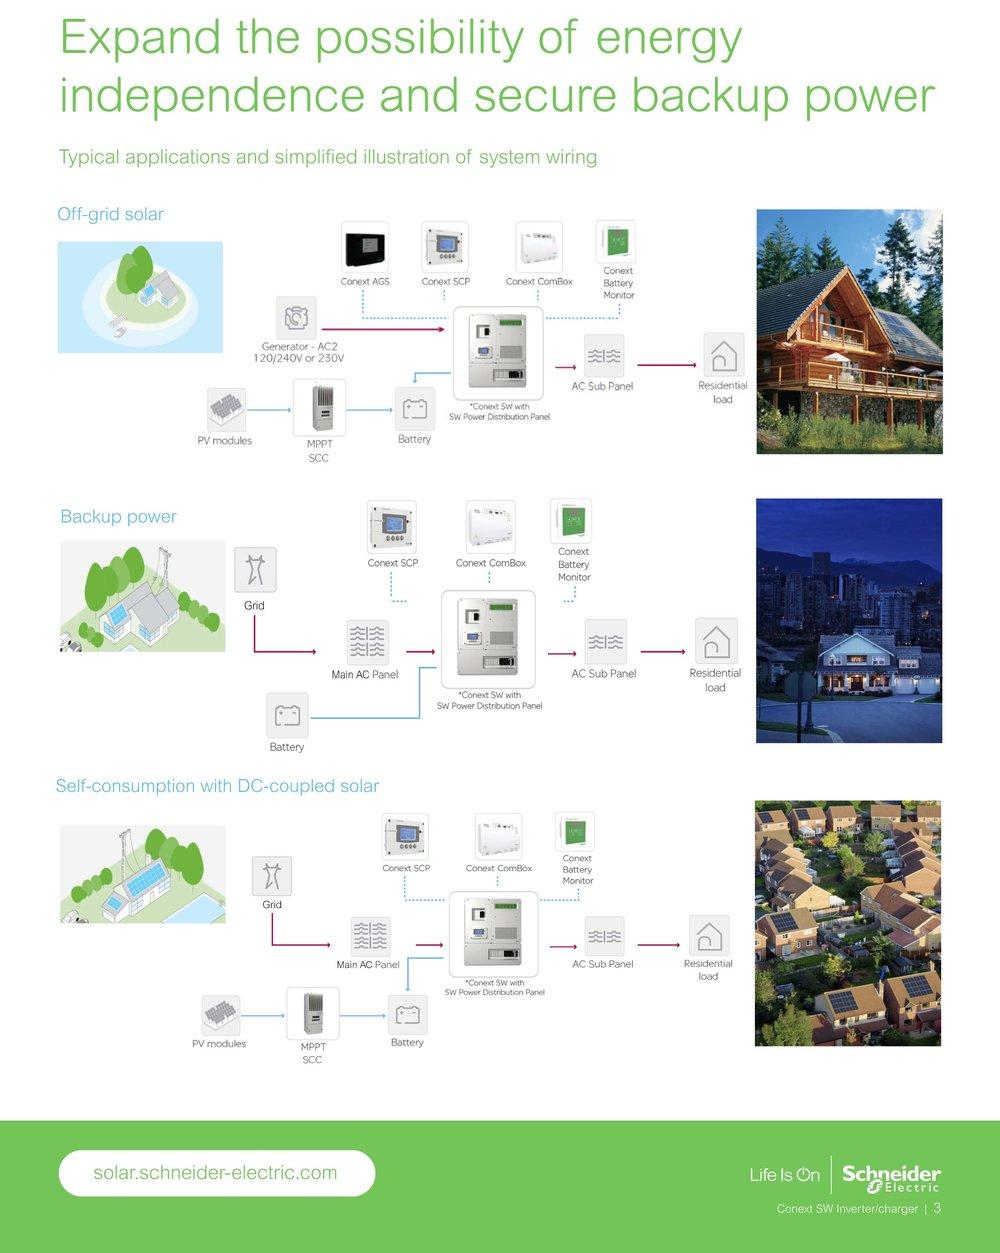 conext-sw-brochure-20160620-3.jpg